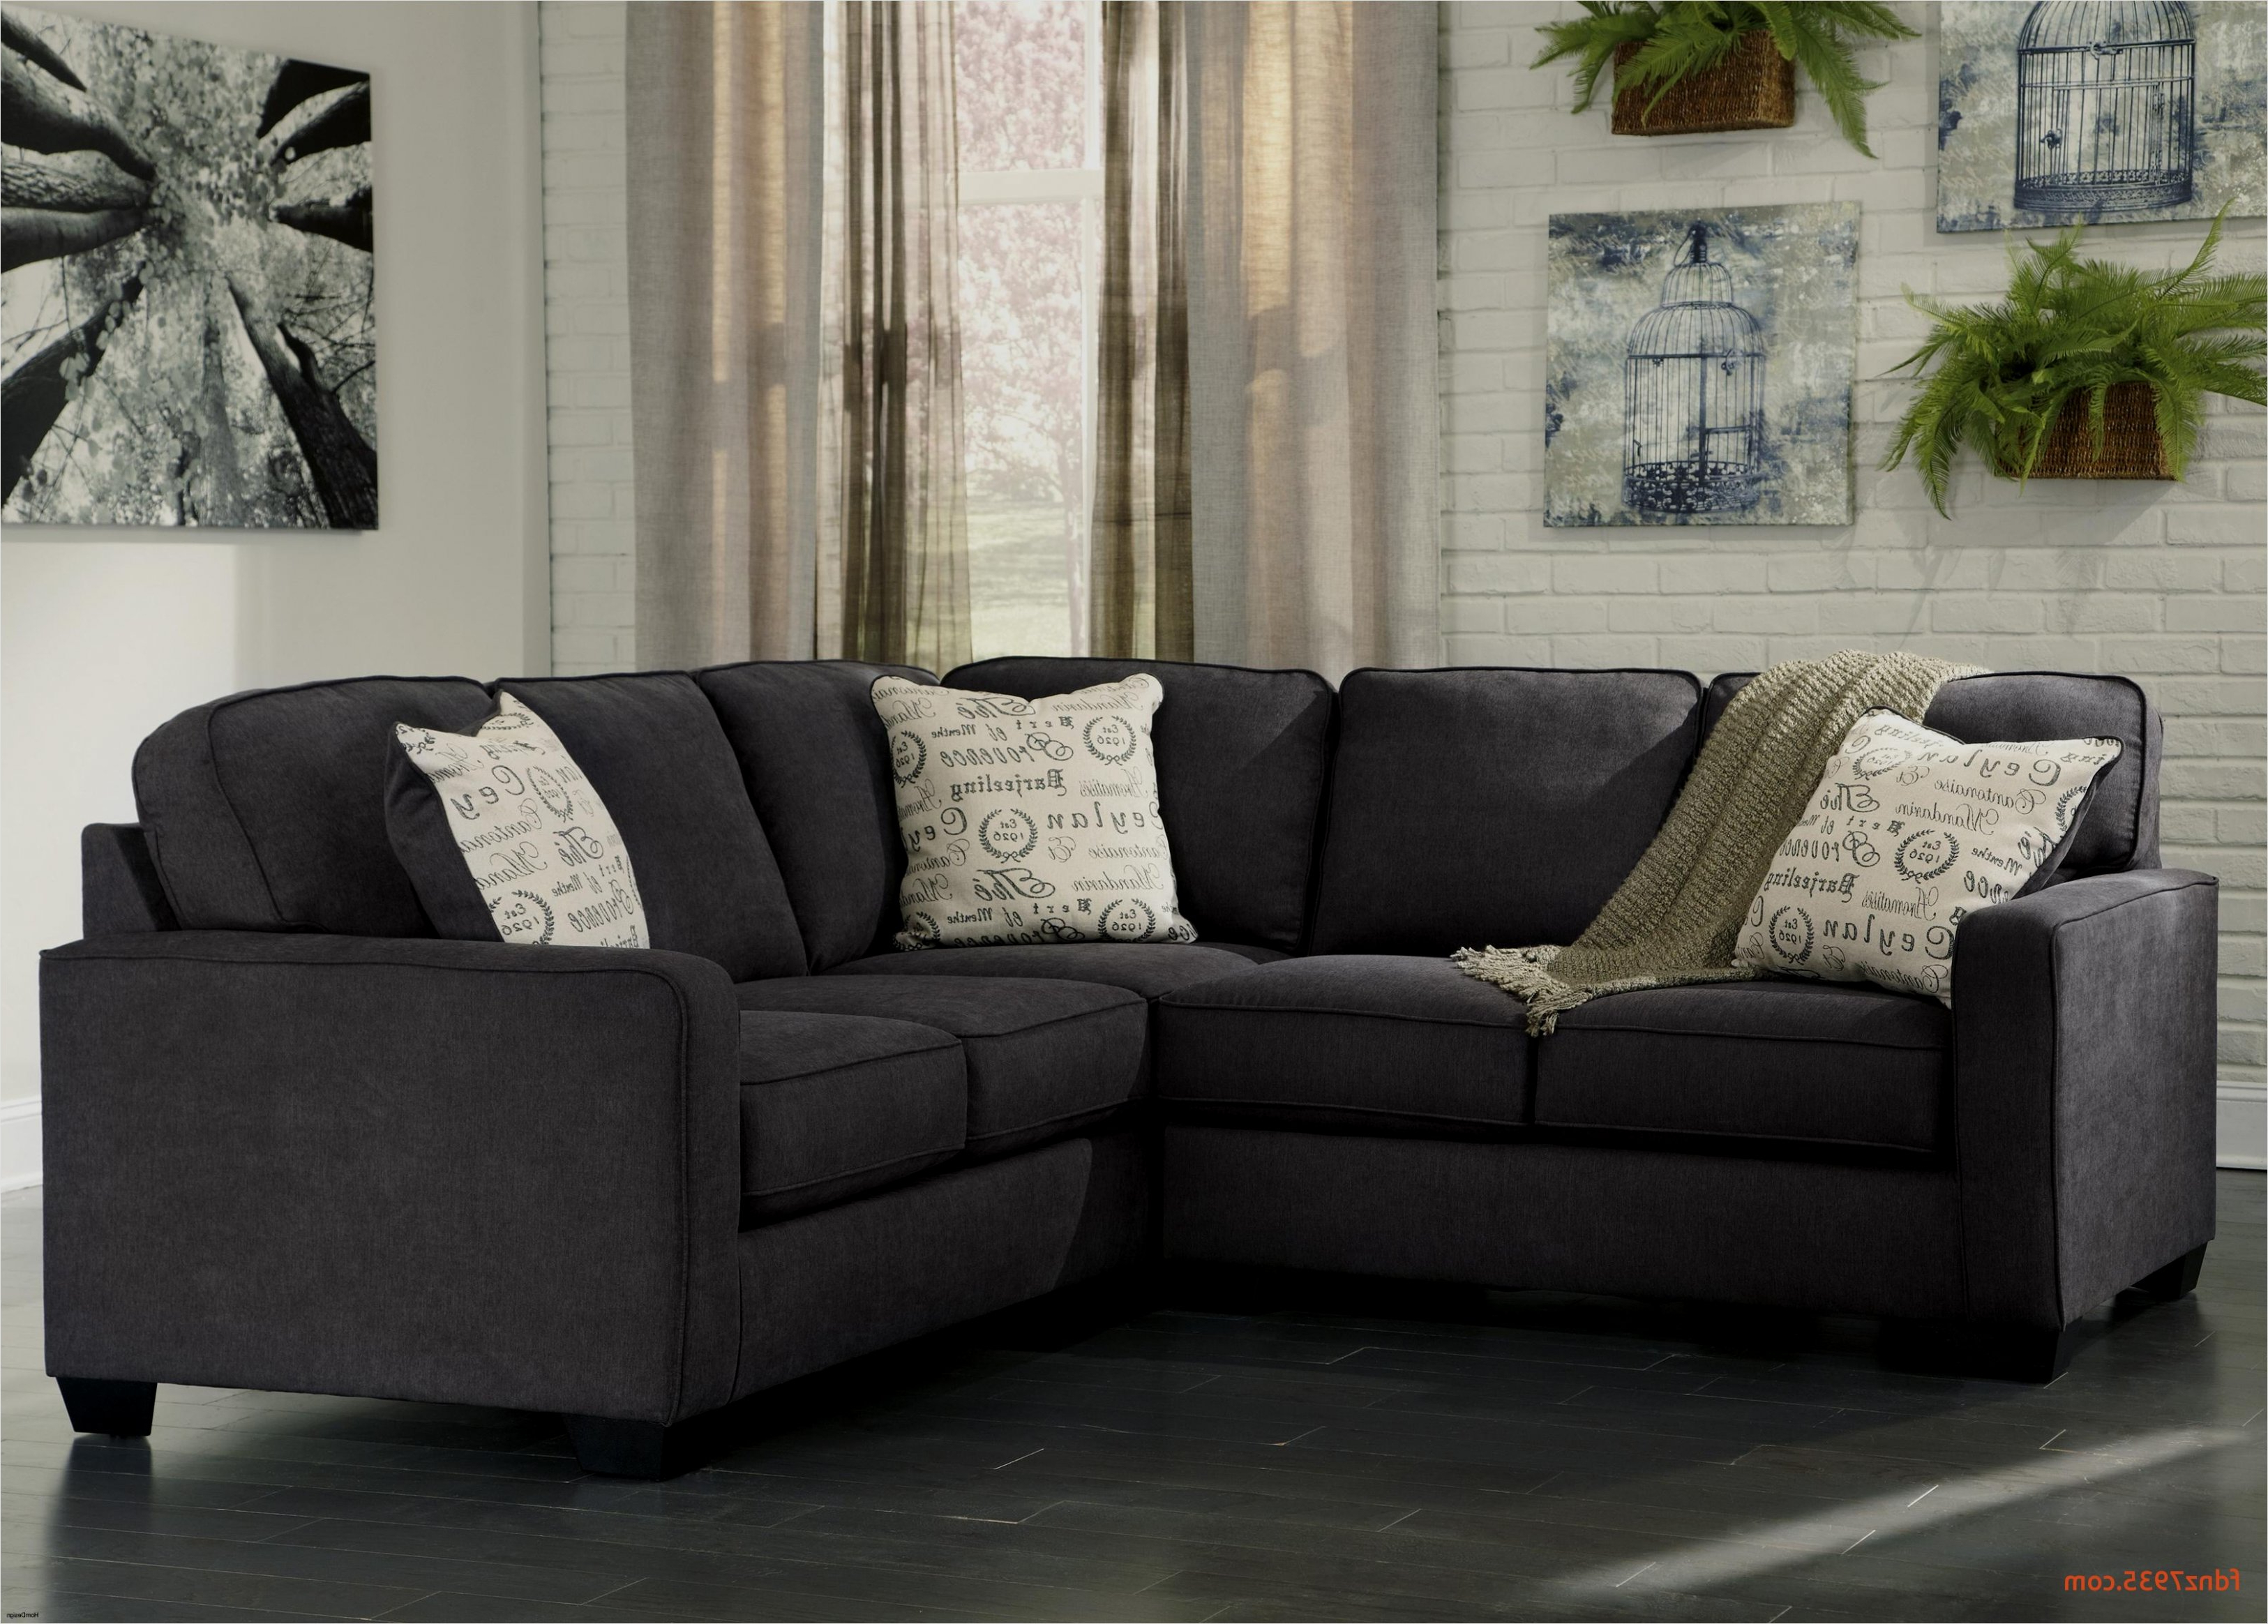 Sofas Valencia Outlet S1du sofas Valencia Outlet Lindo sofas for Less Fresh sofa Design